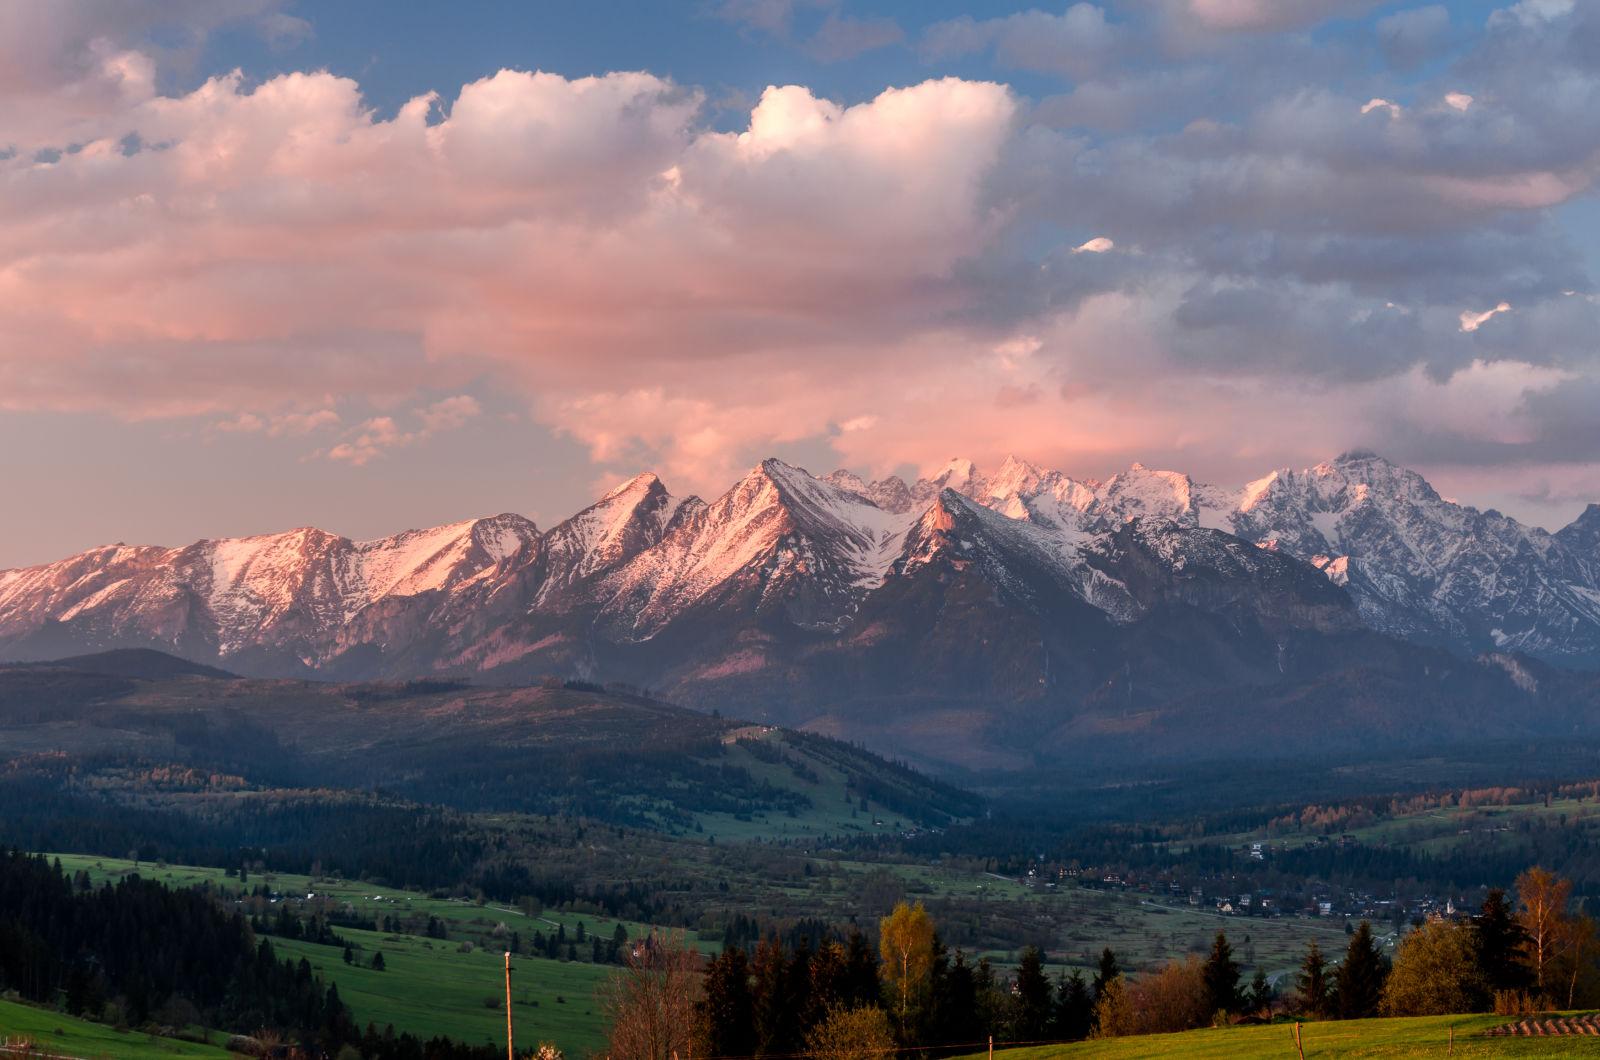 Europe, Slovakia, Tatra Mountains